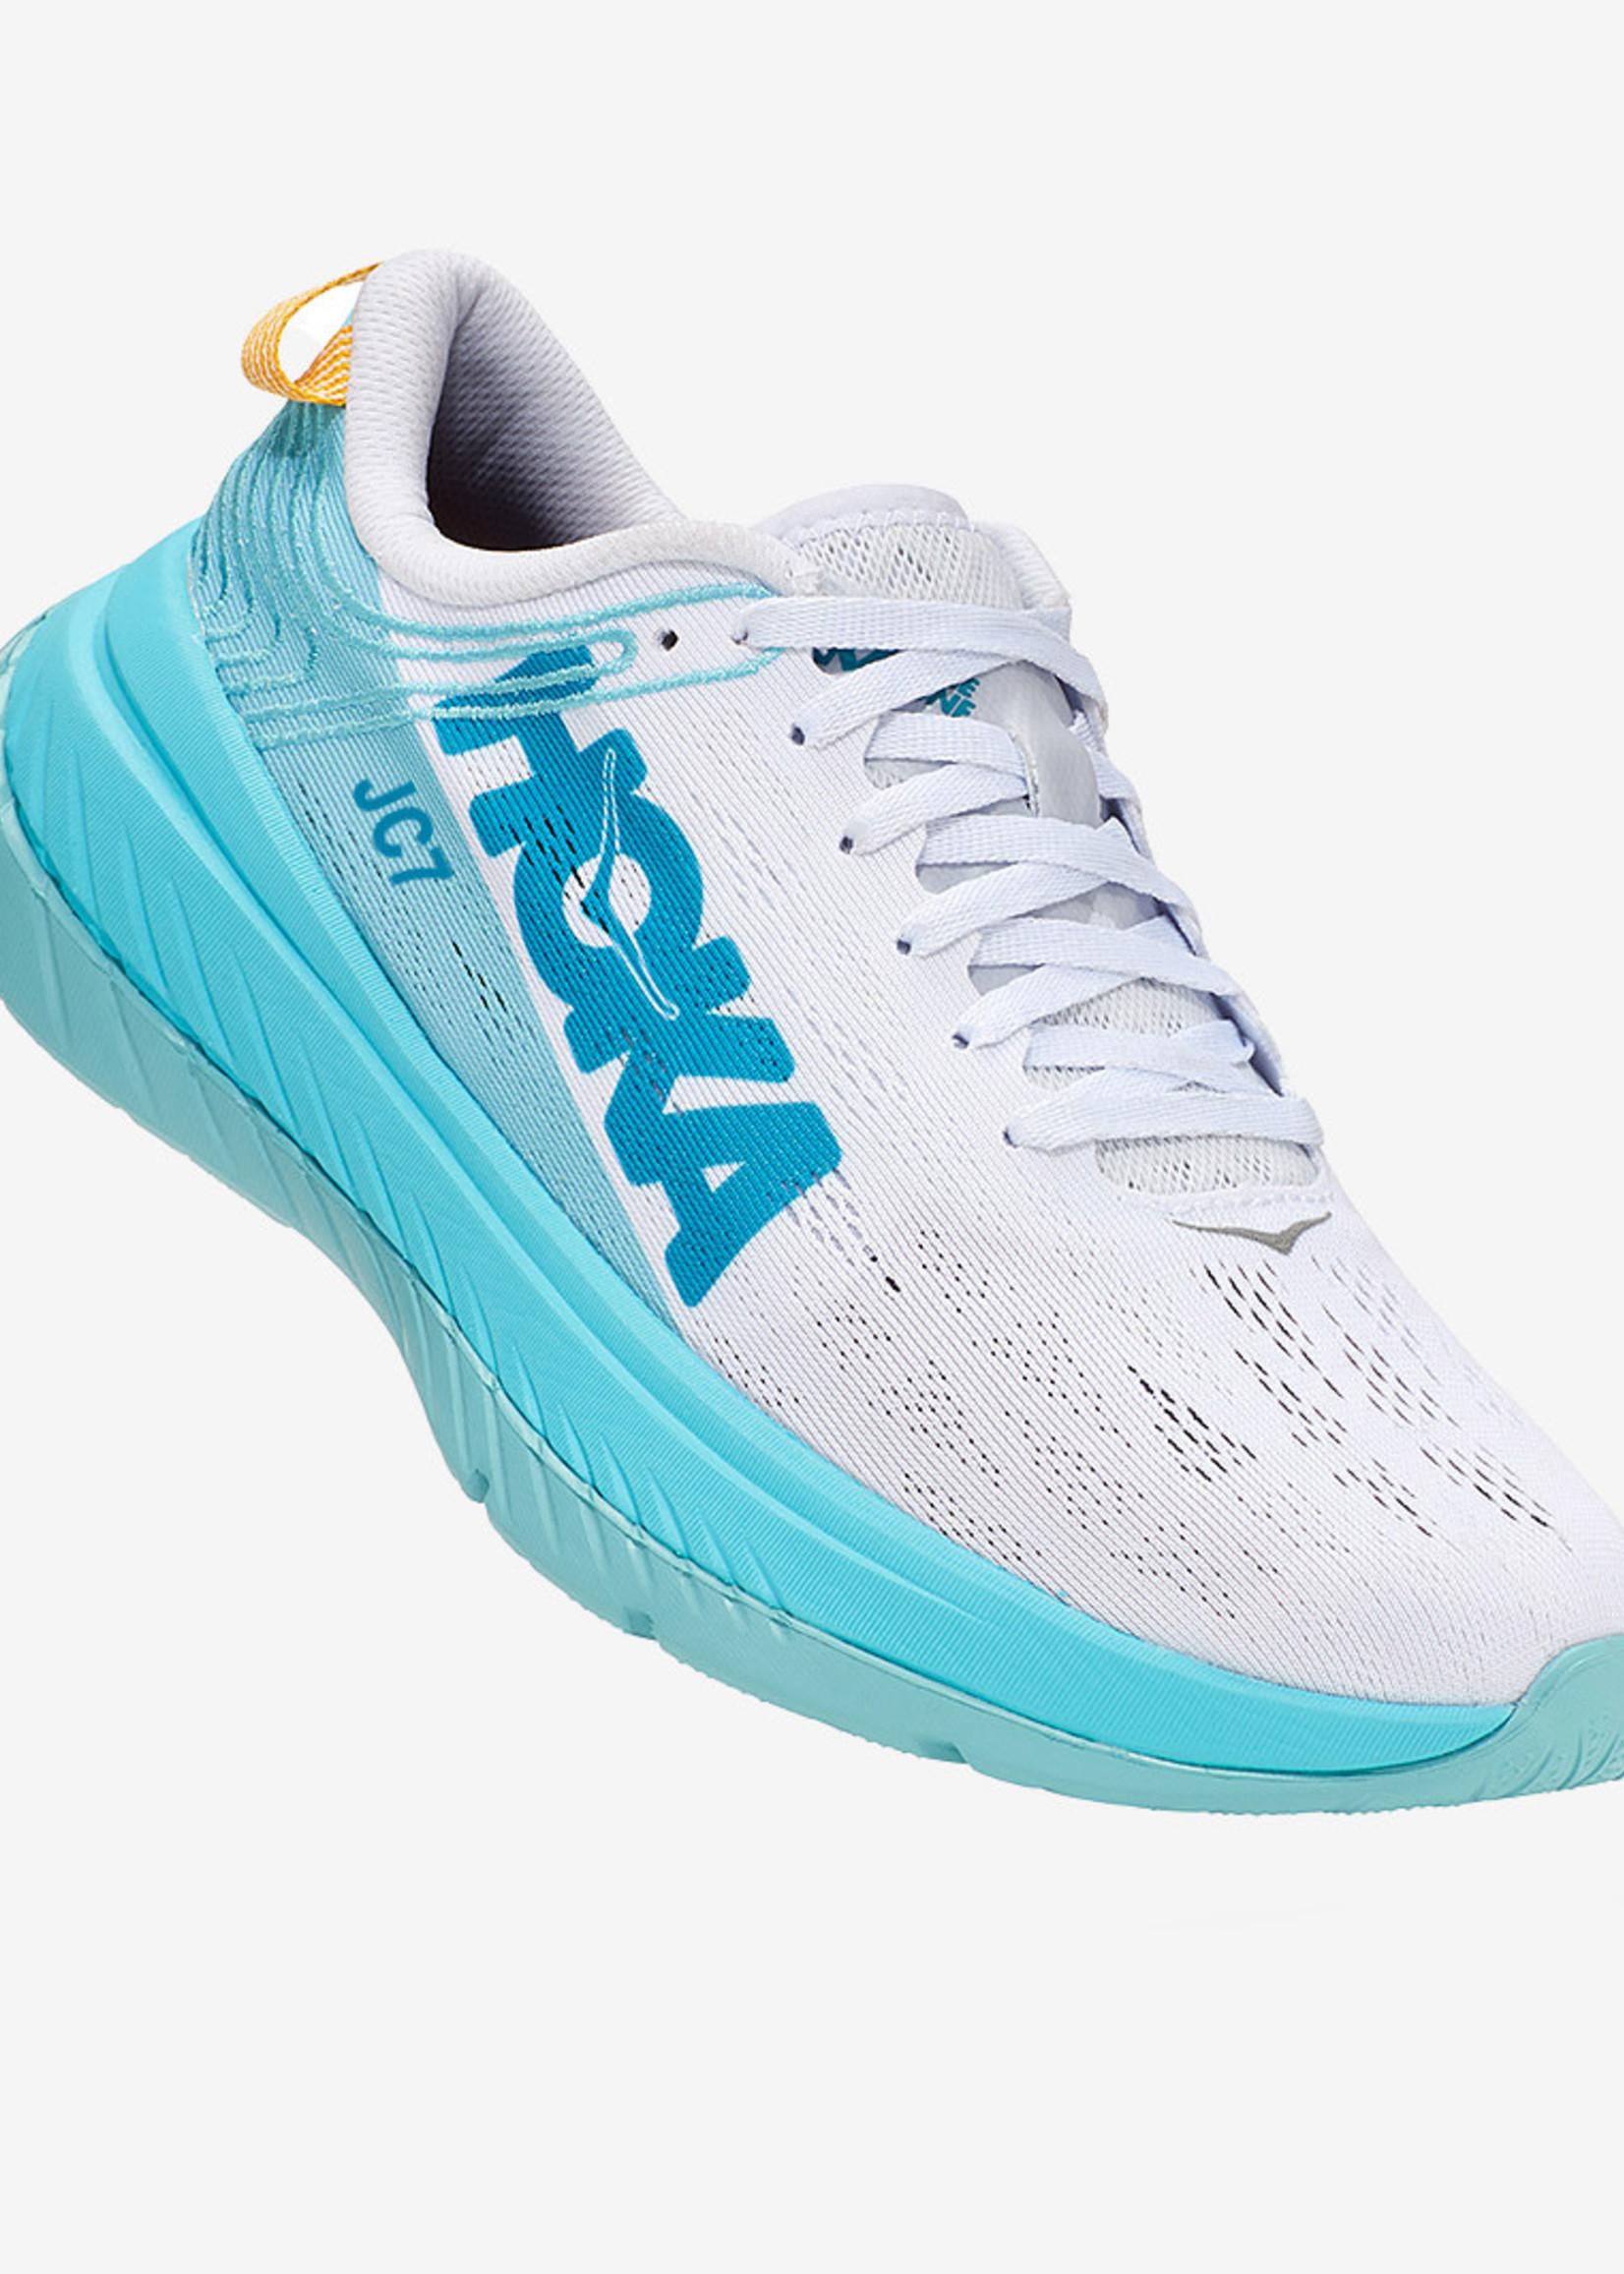 Hoka One One HOKA Carbon X Women's Road Running Shoes